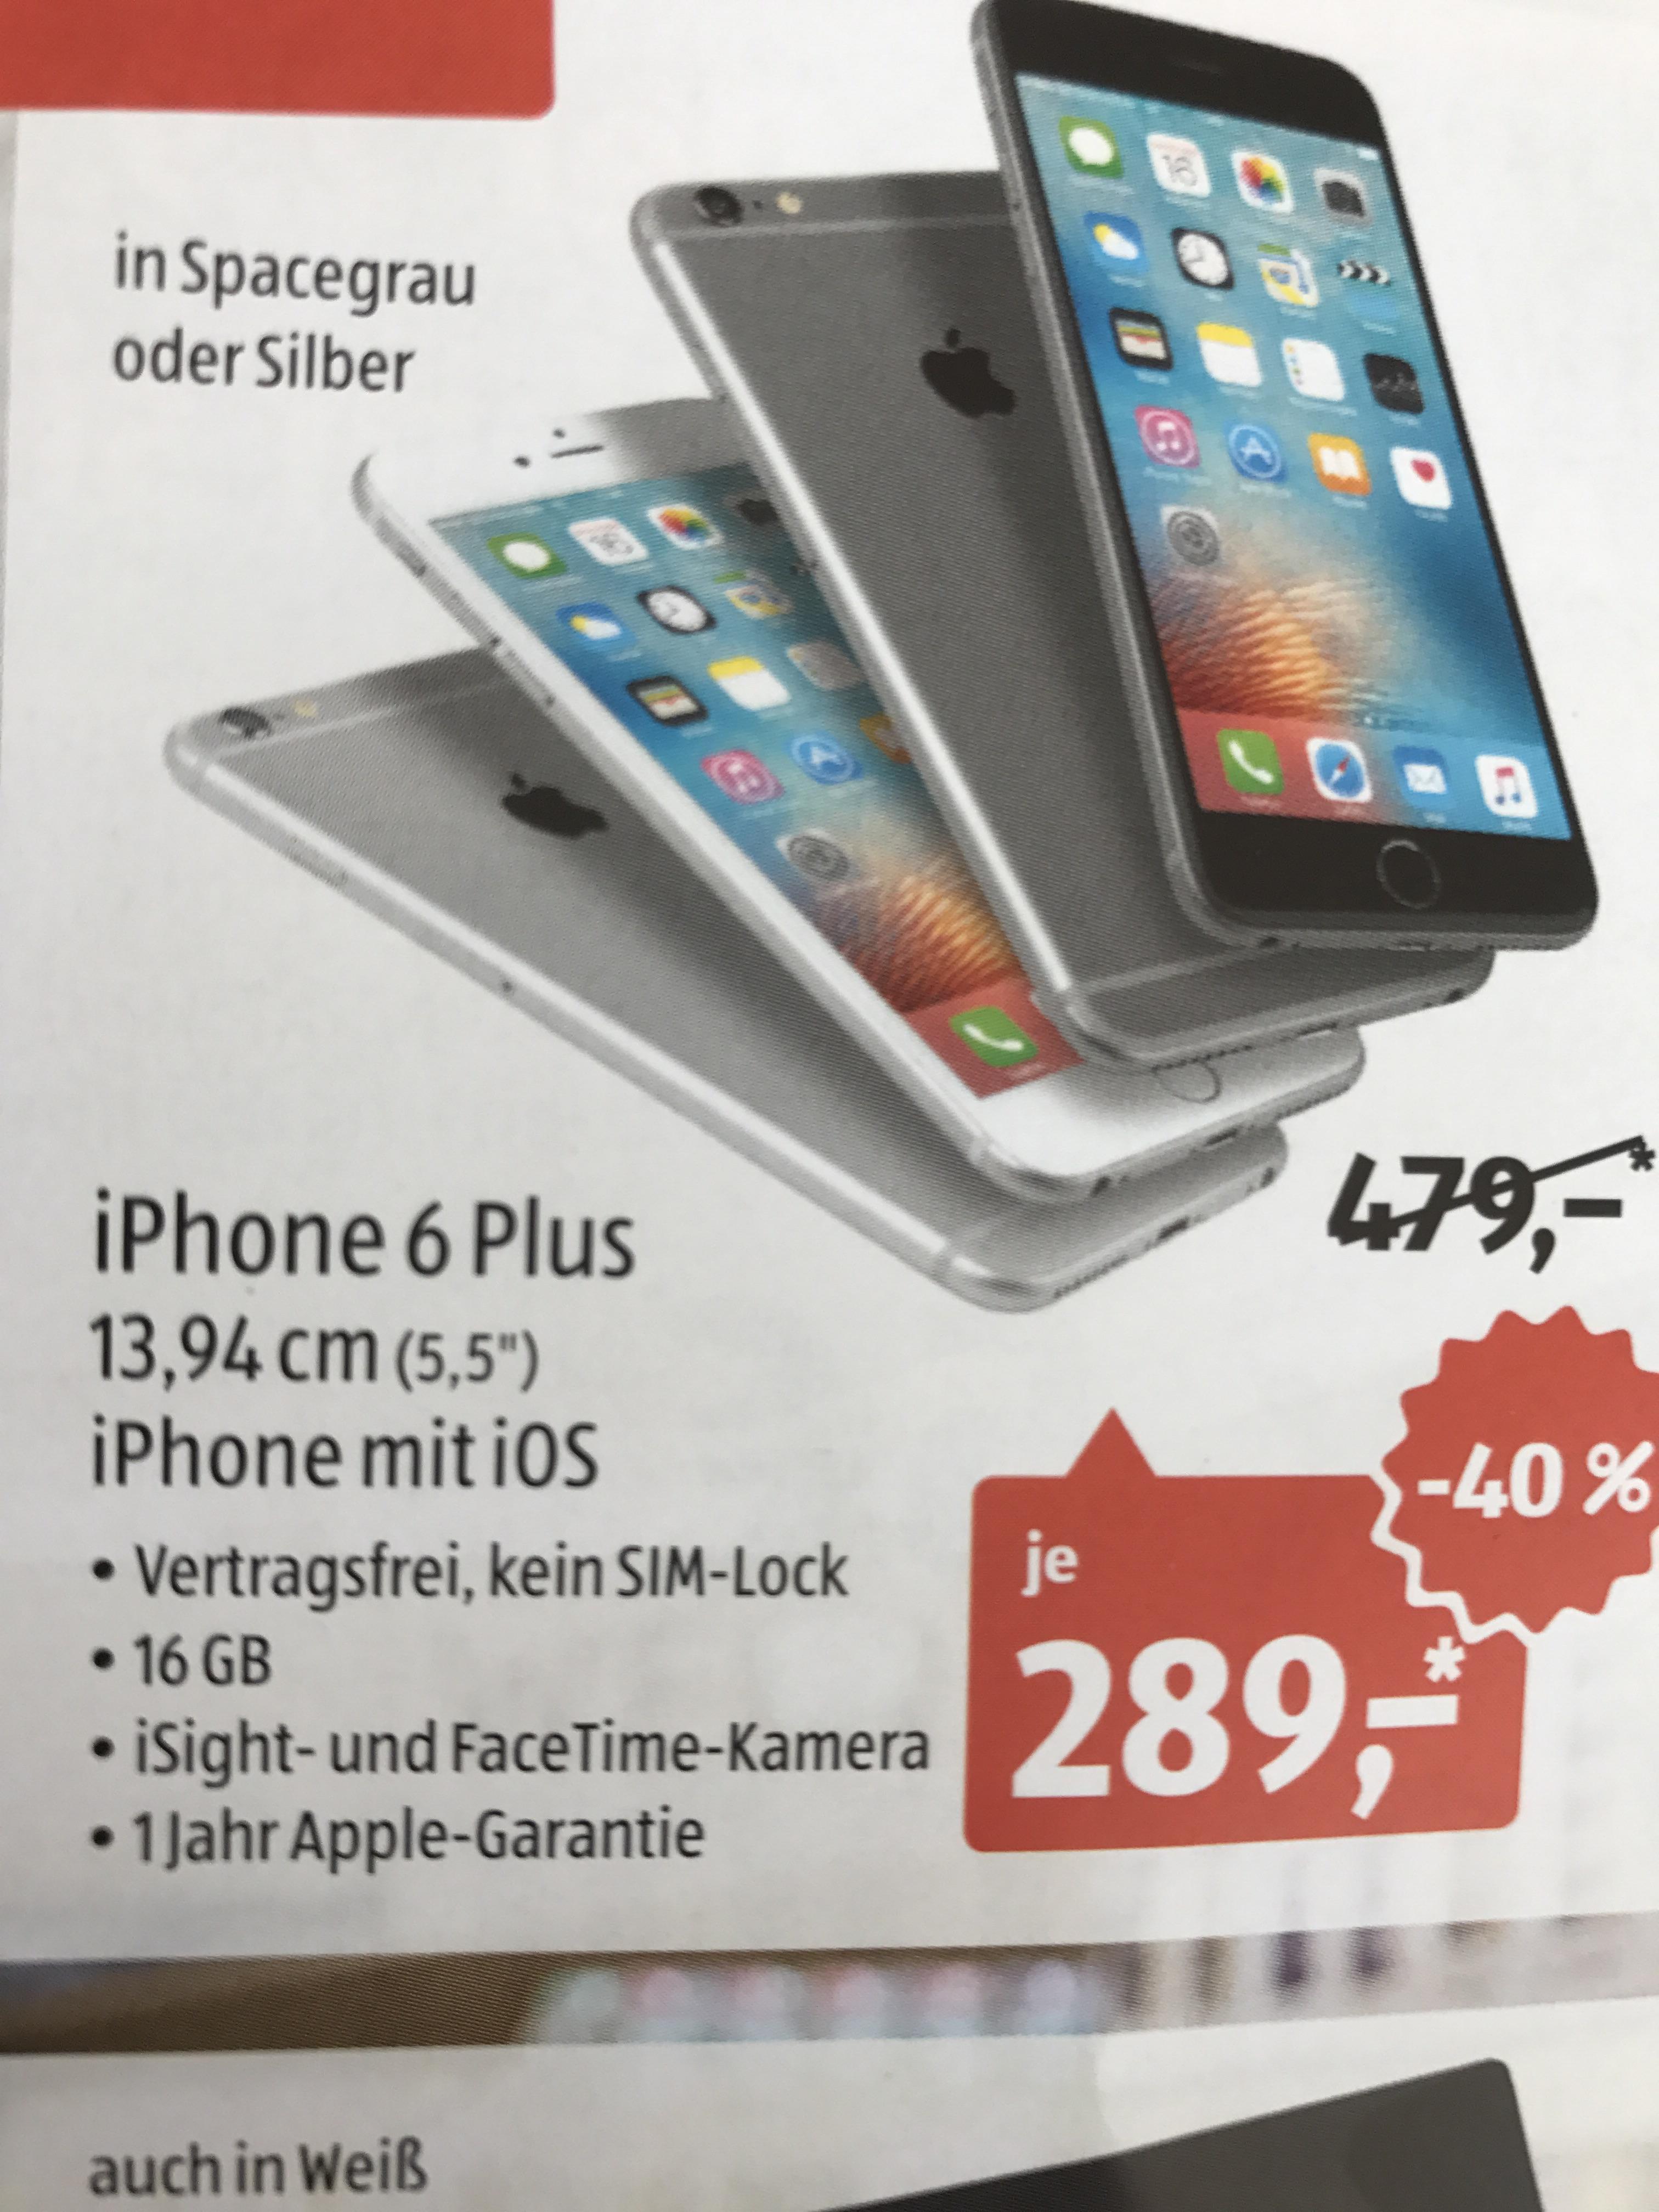 Lokal - Viersen - Aldi Süd Iphone 6 Plus offline